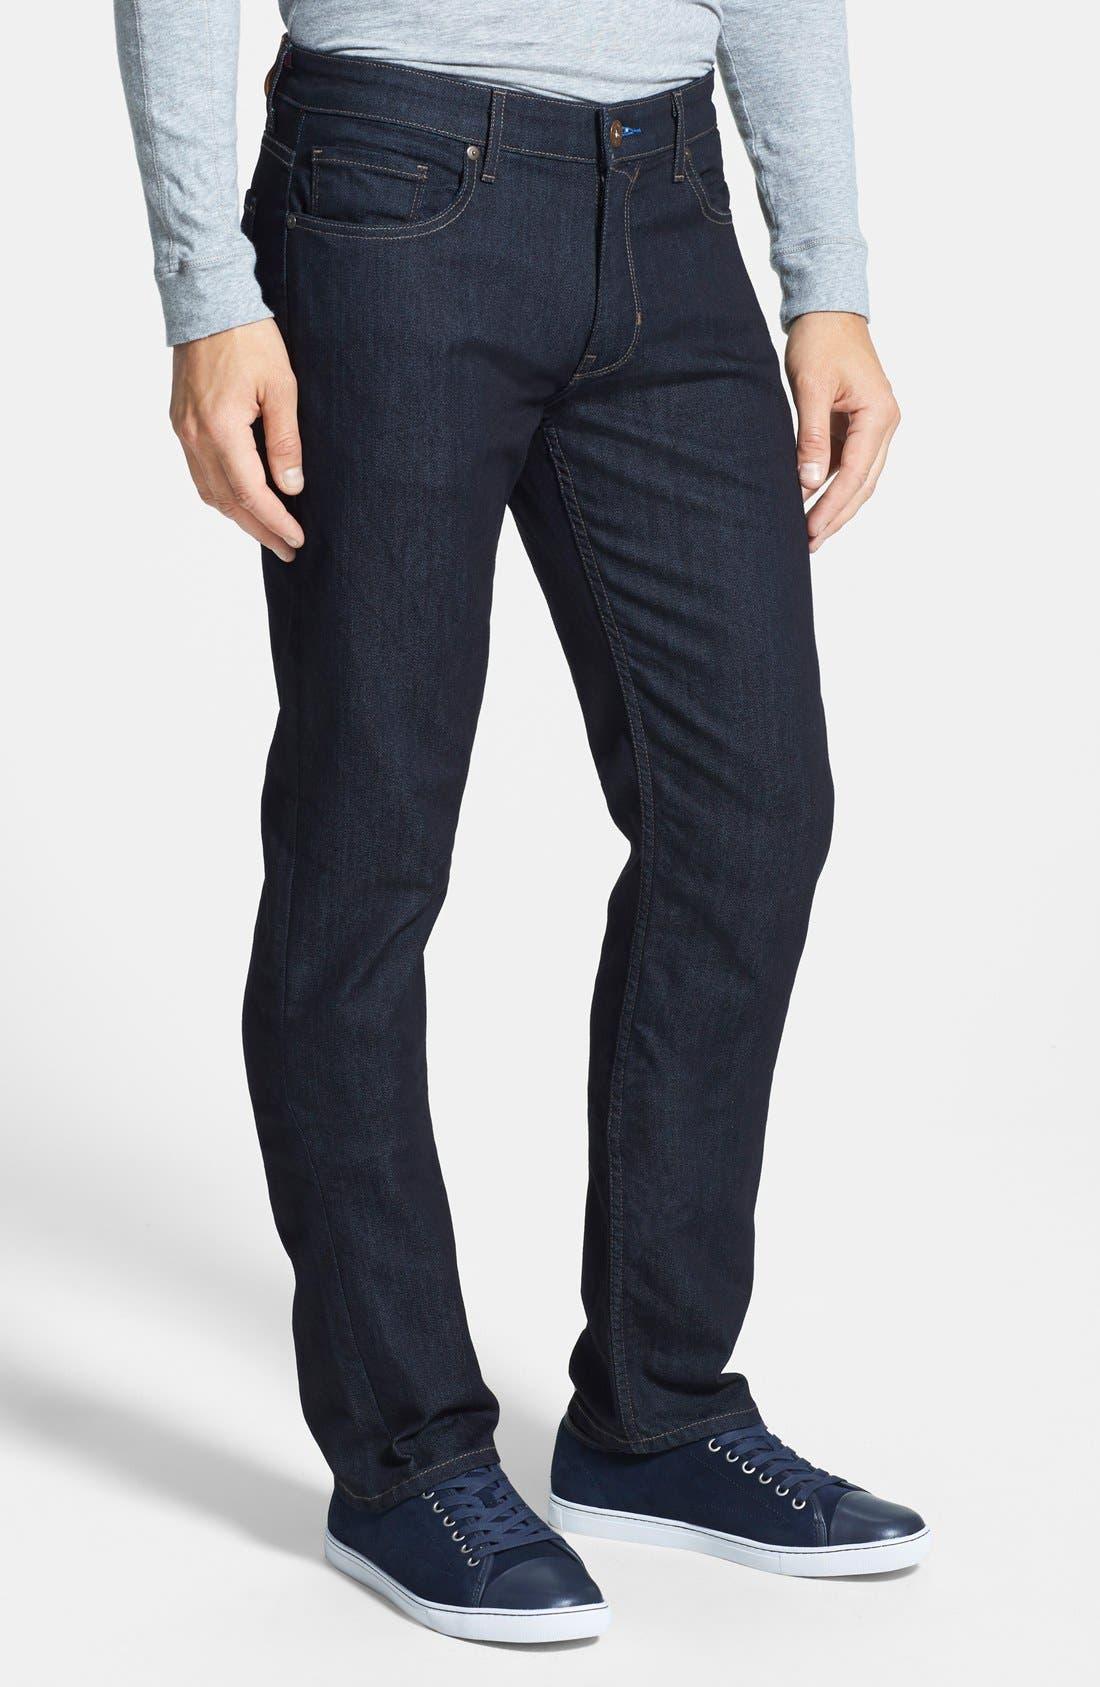 'Normandie' Straight Leg Jeans,                             Alternate thumbnail 4, color,                             400